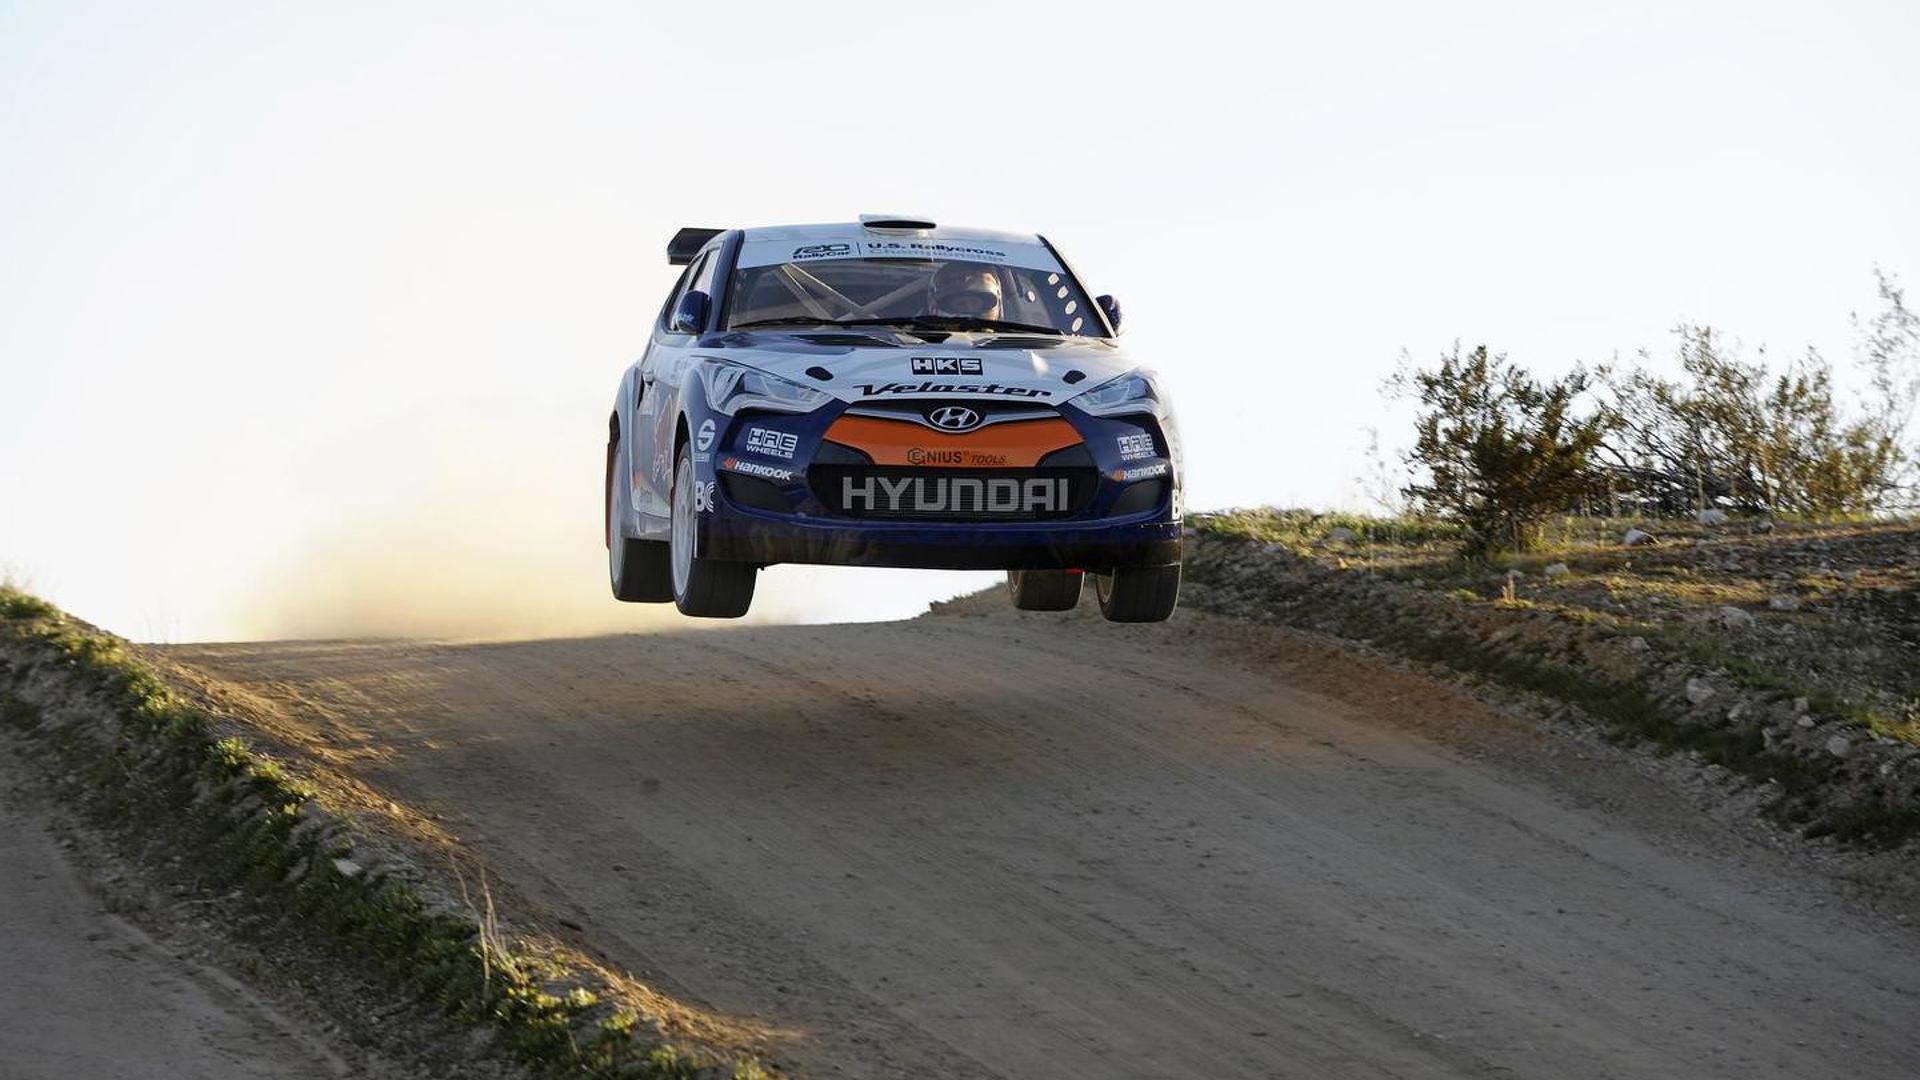 RMR Hyundai Veloster rally car unveiled